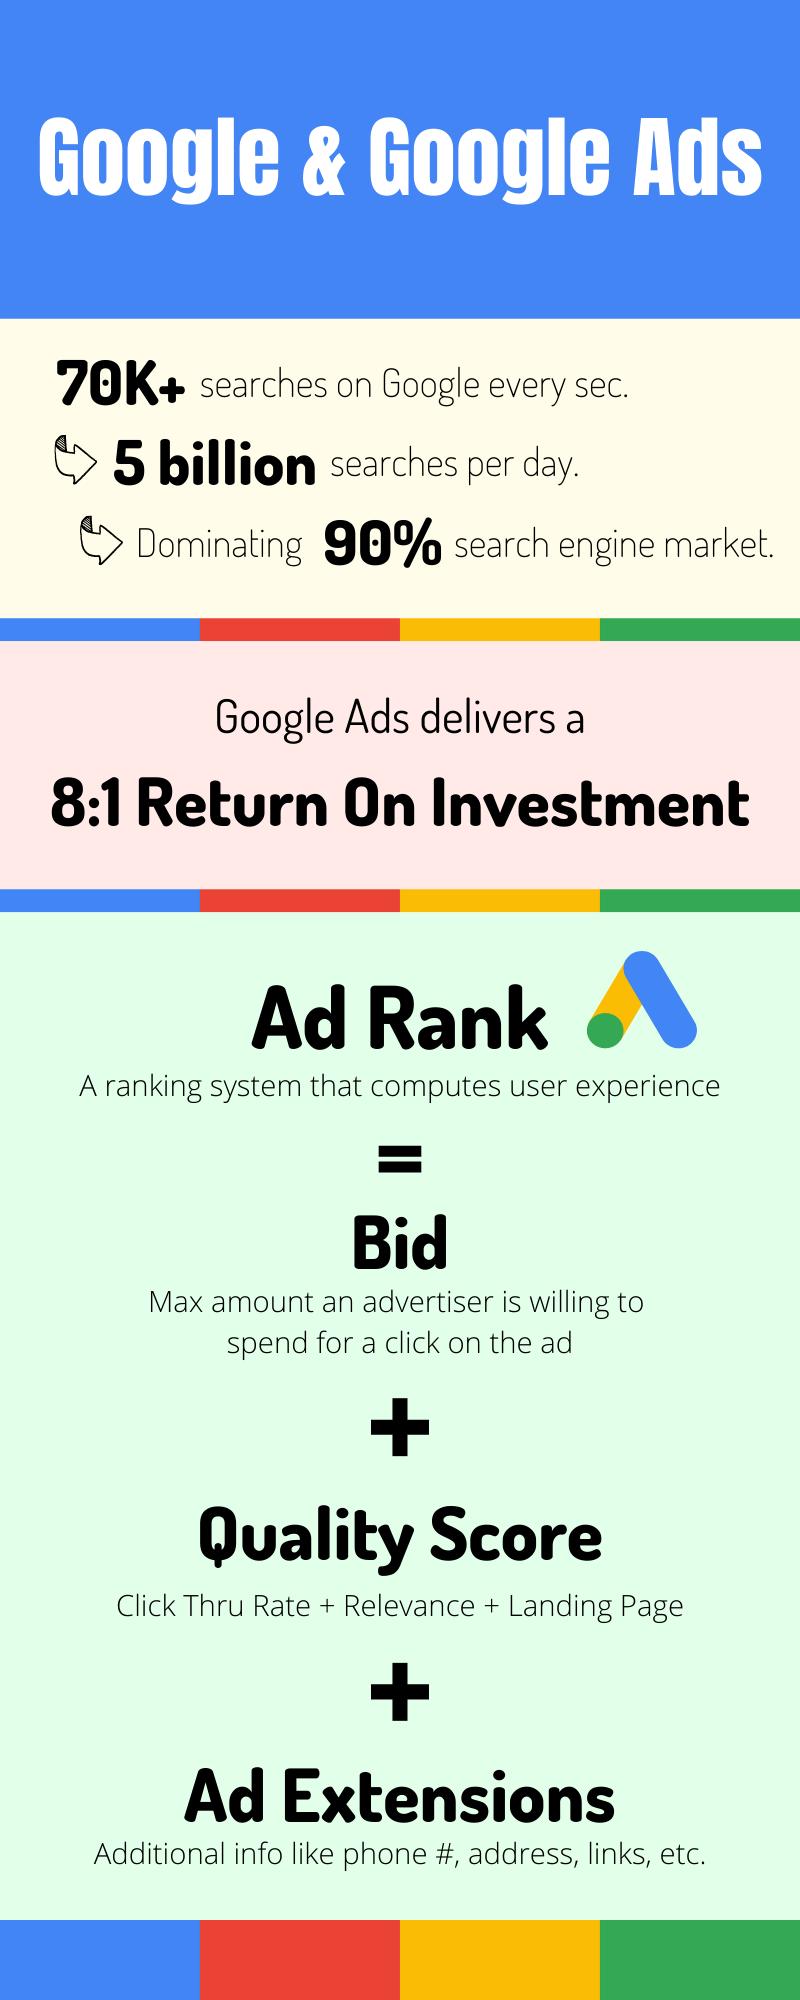 Google Ads Infographic